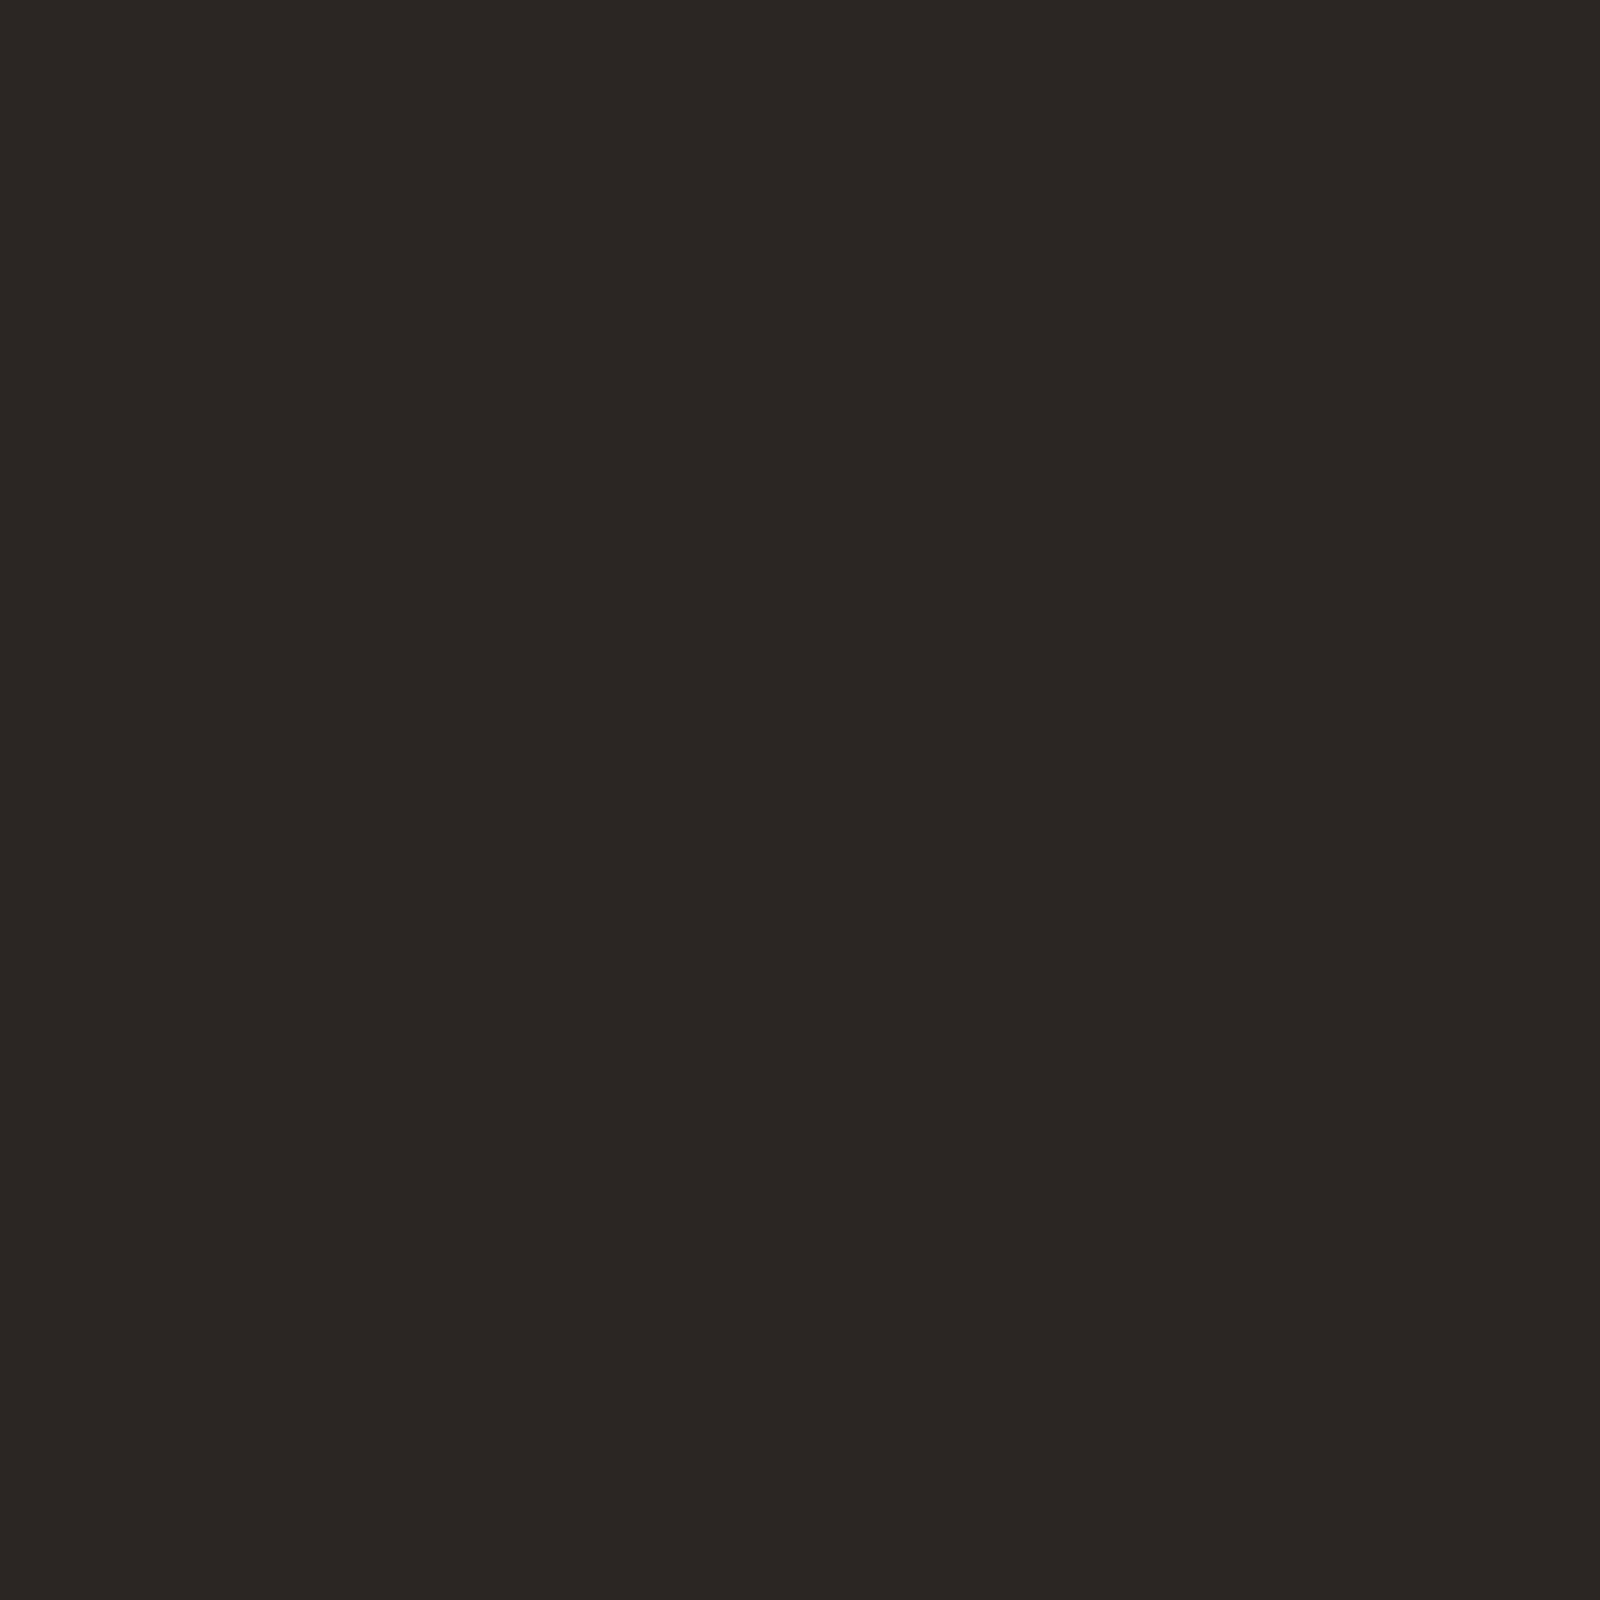 Michael Kors Hamilton Black Saffiano Leather Satchel